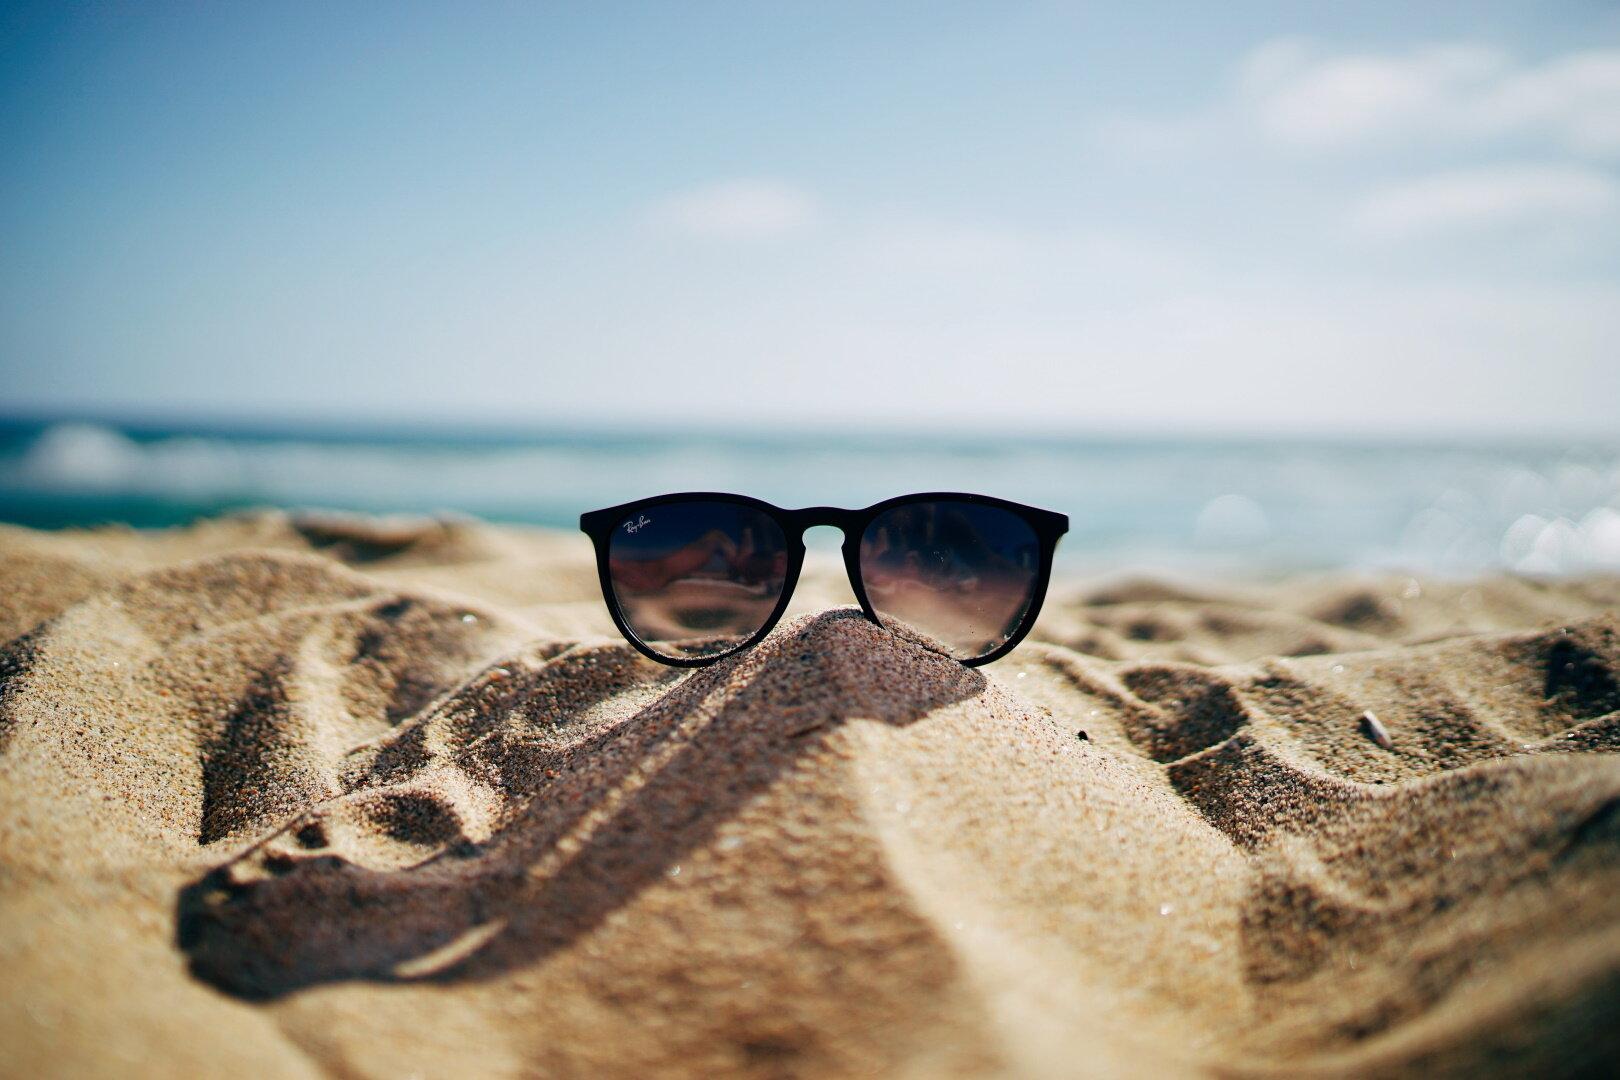 sunglasses21080.jpg